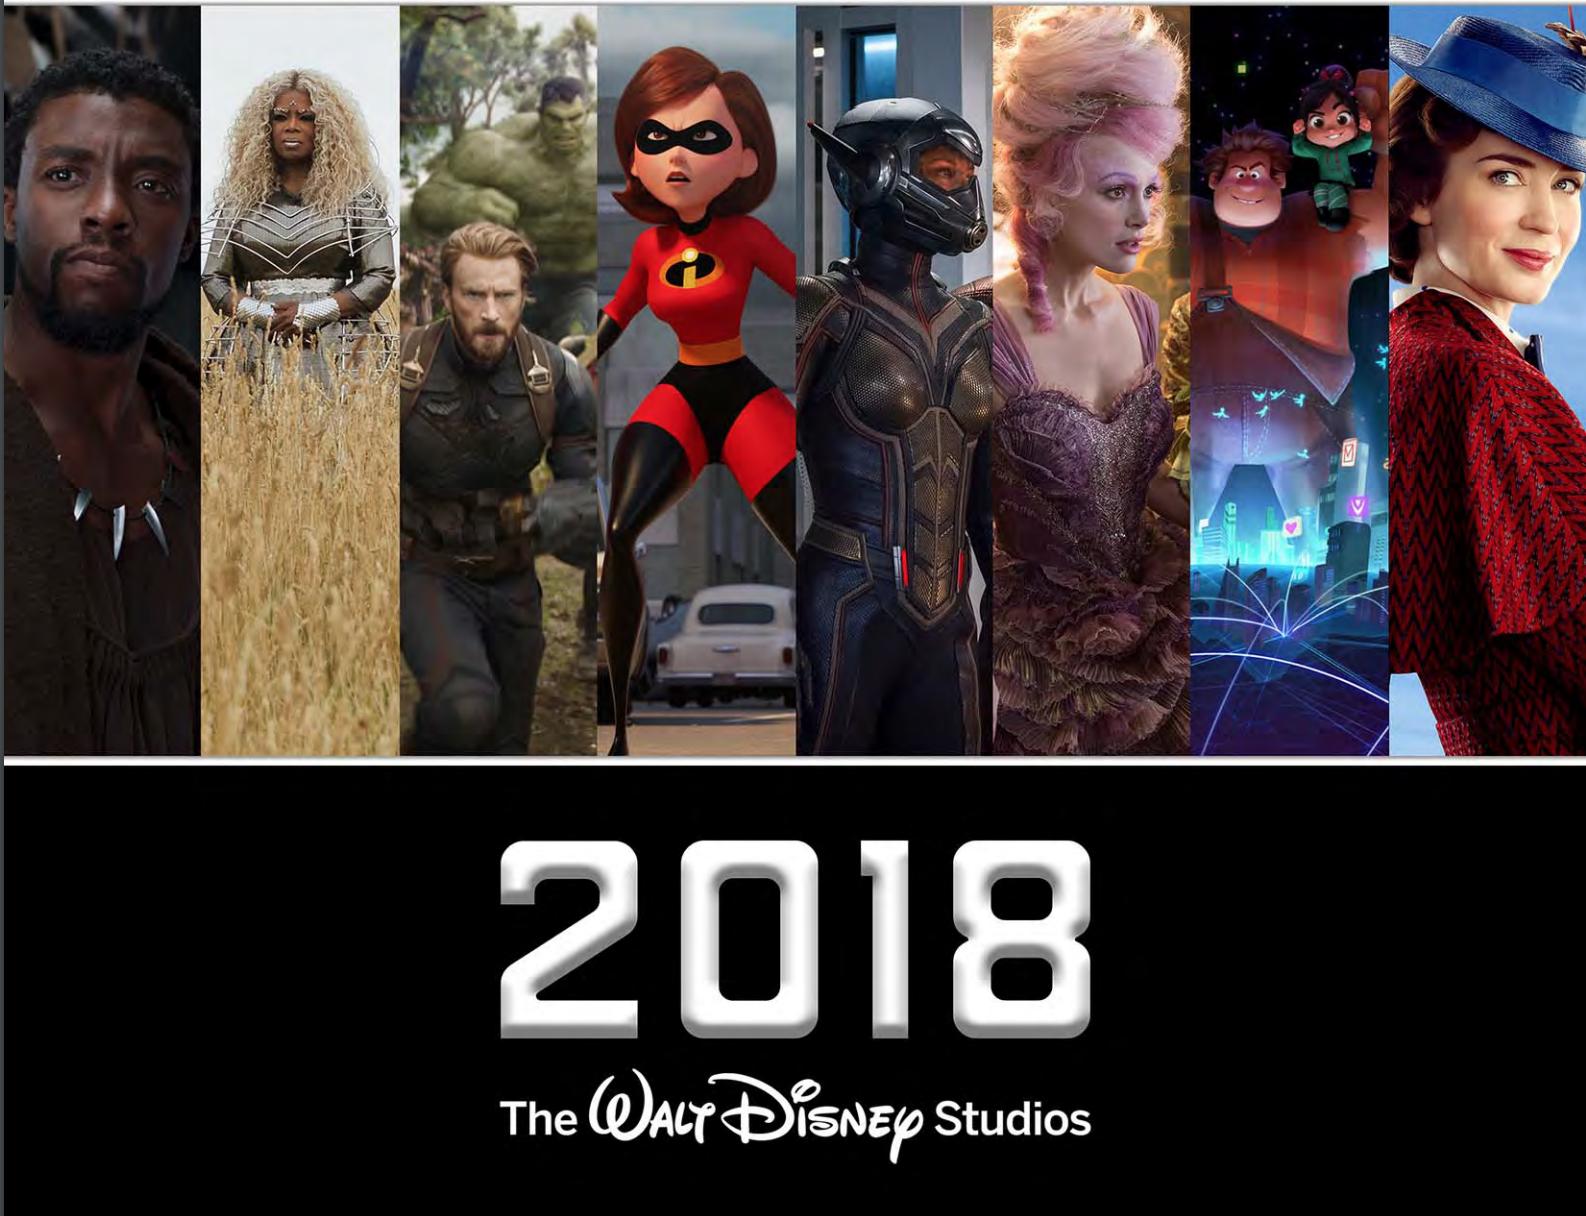 2018 Disney Movie Release Dates